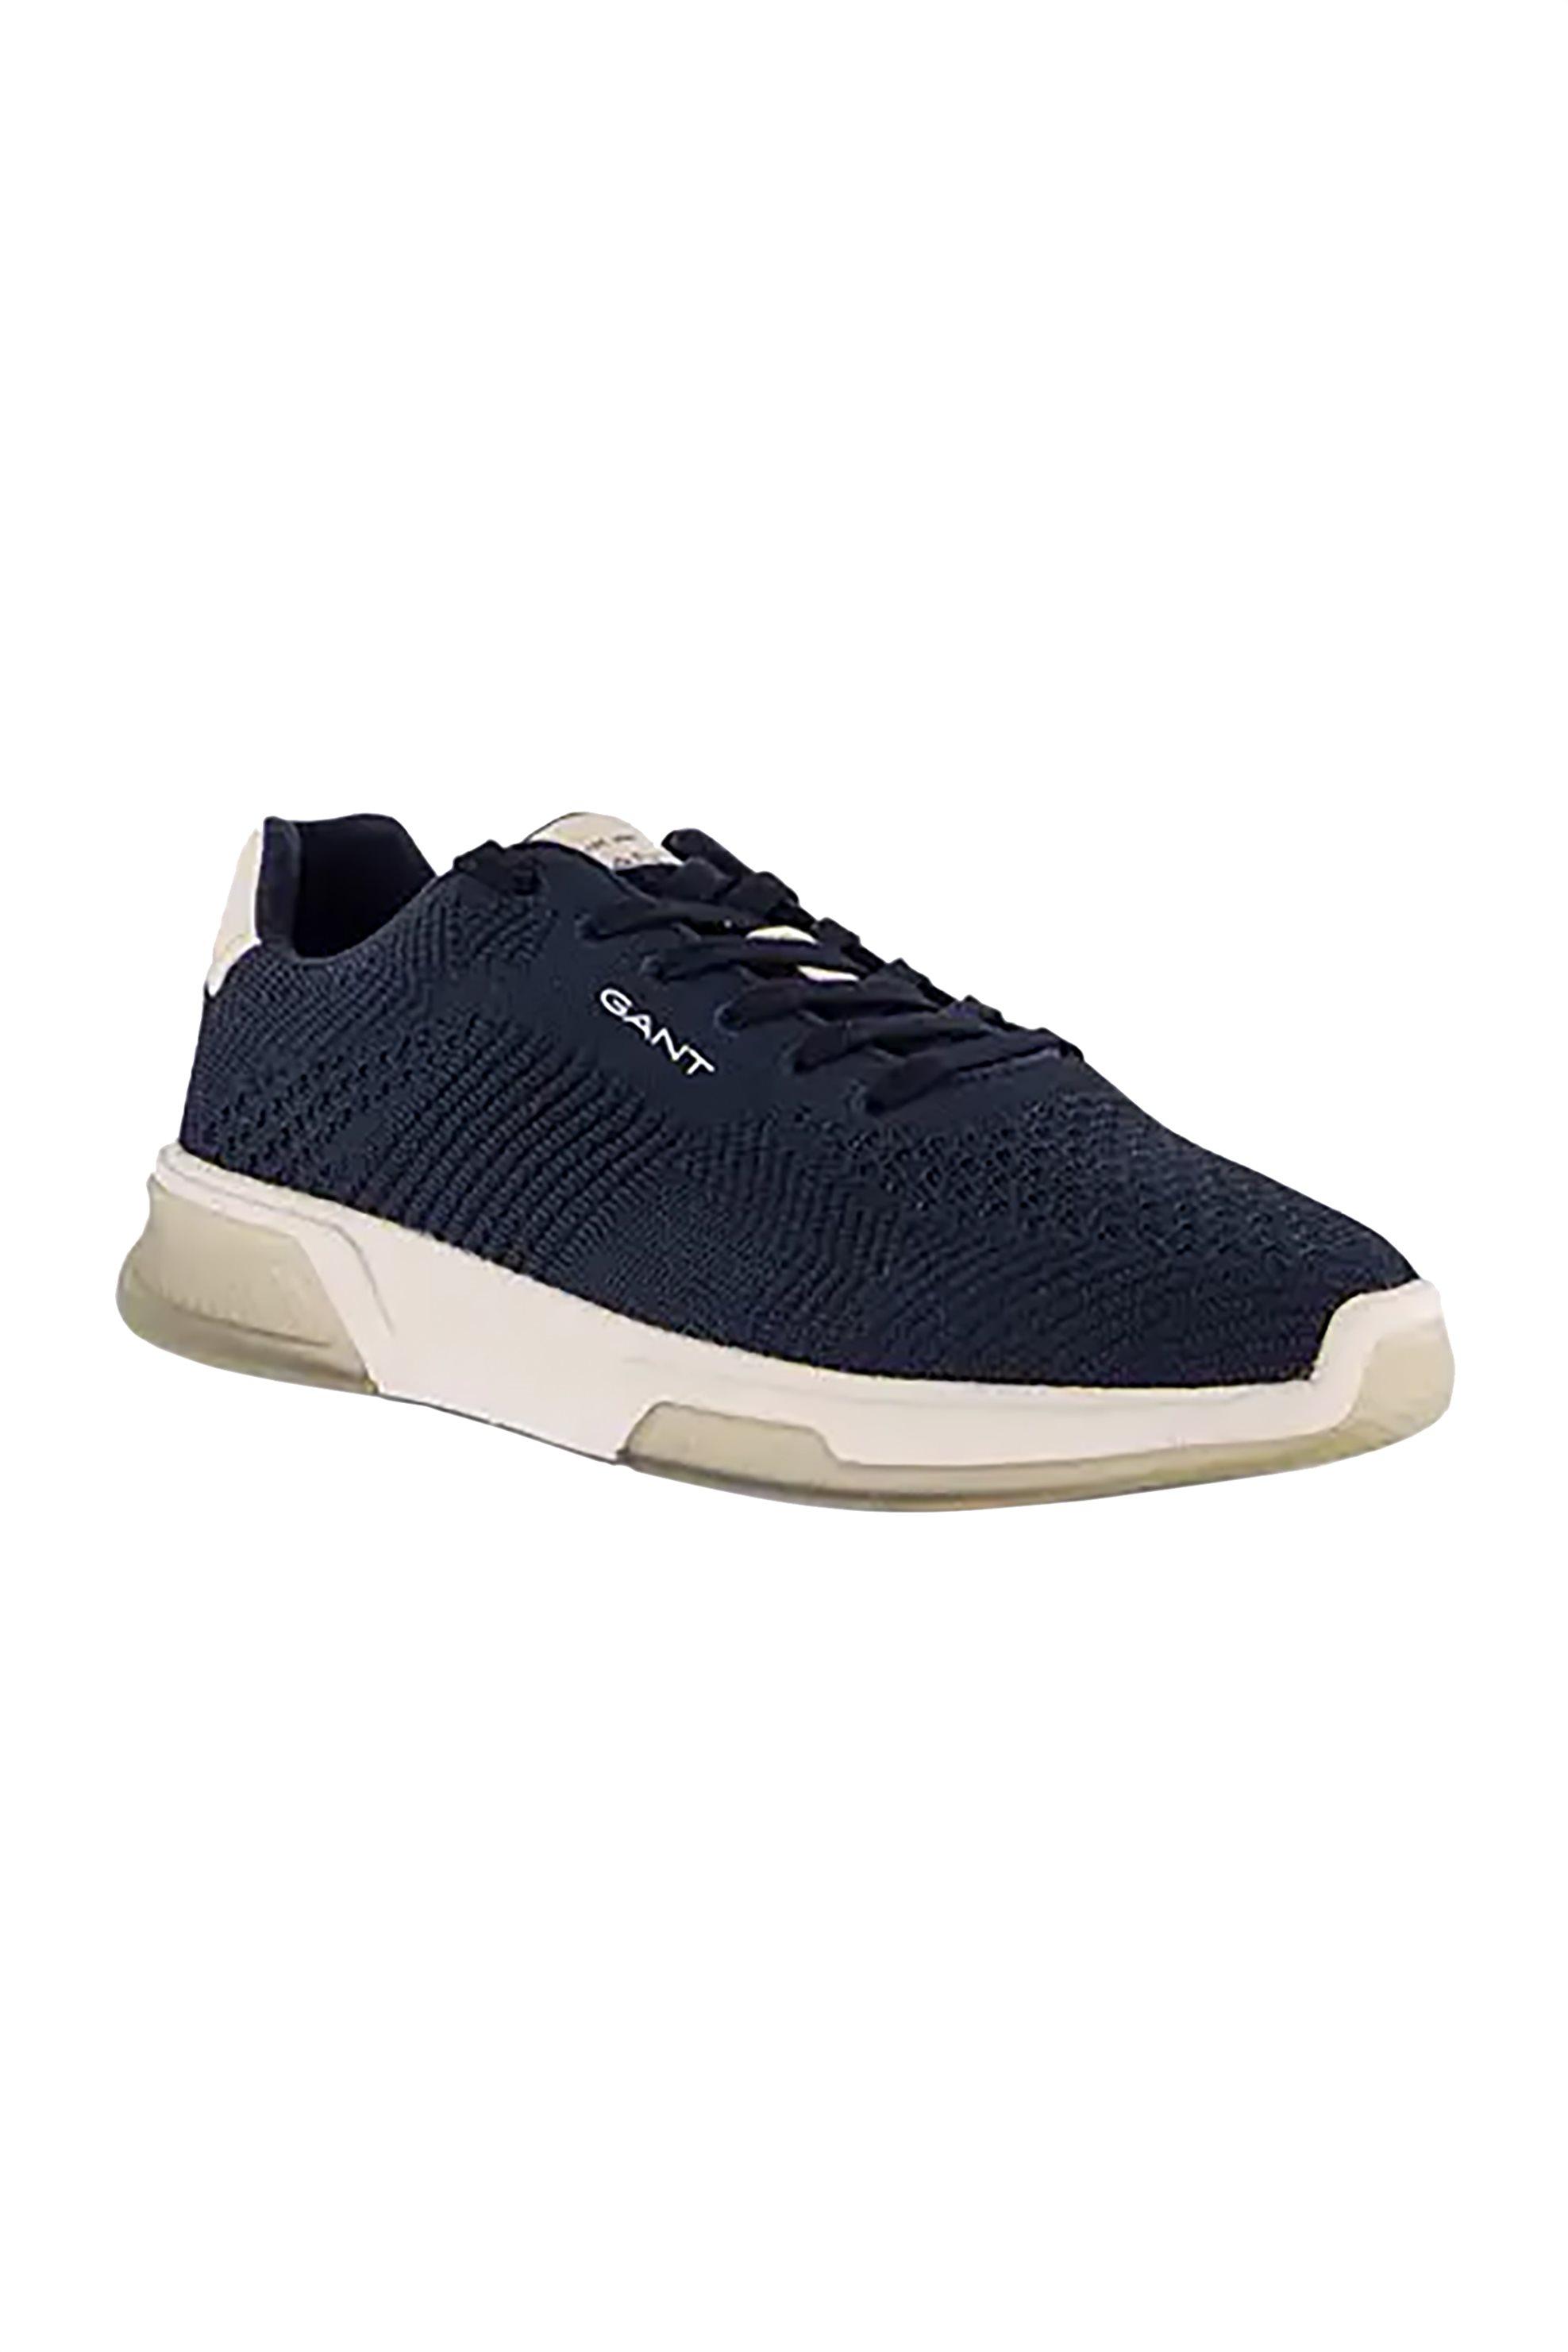 "Gant ανδρικά sneakers με κορδόνια ""Hightown"" – 20639528 – Μπλε Σκούρο"